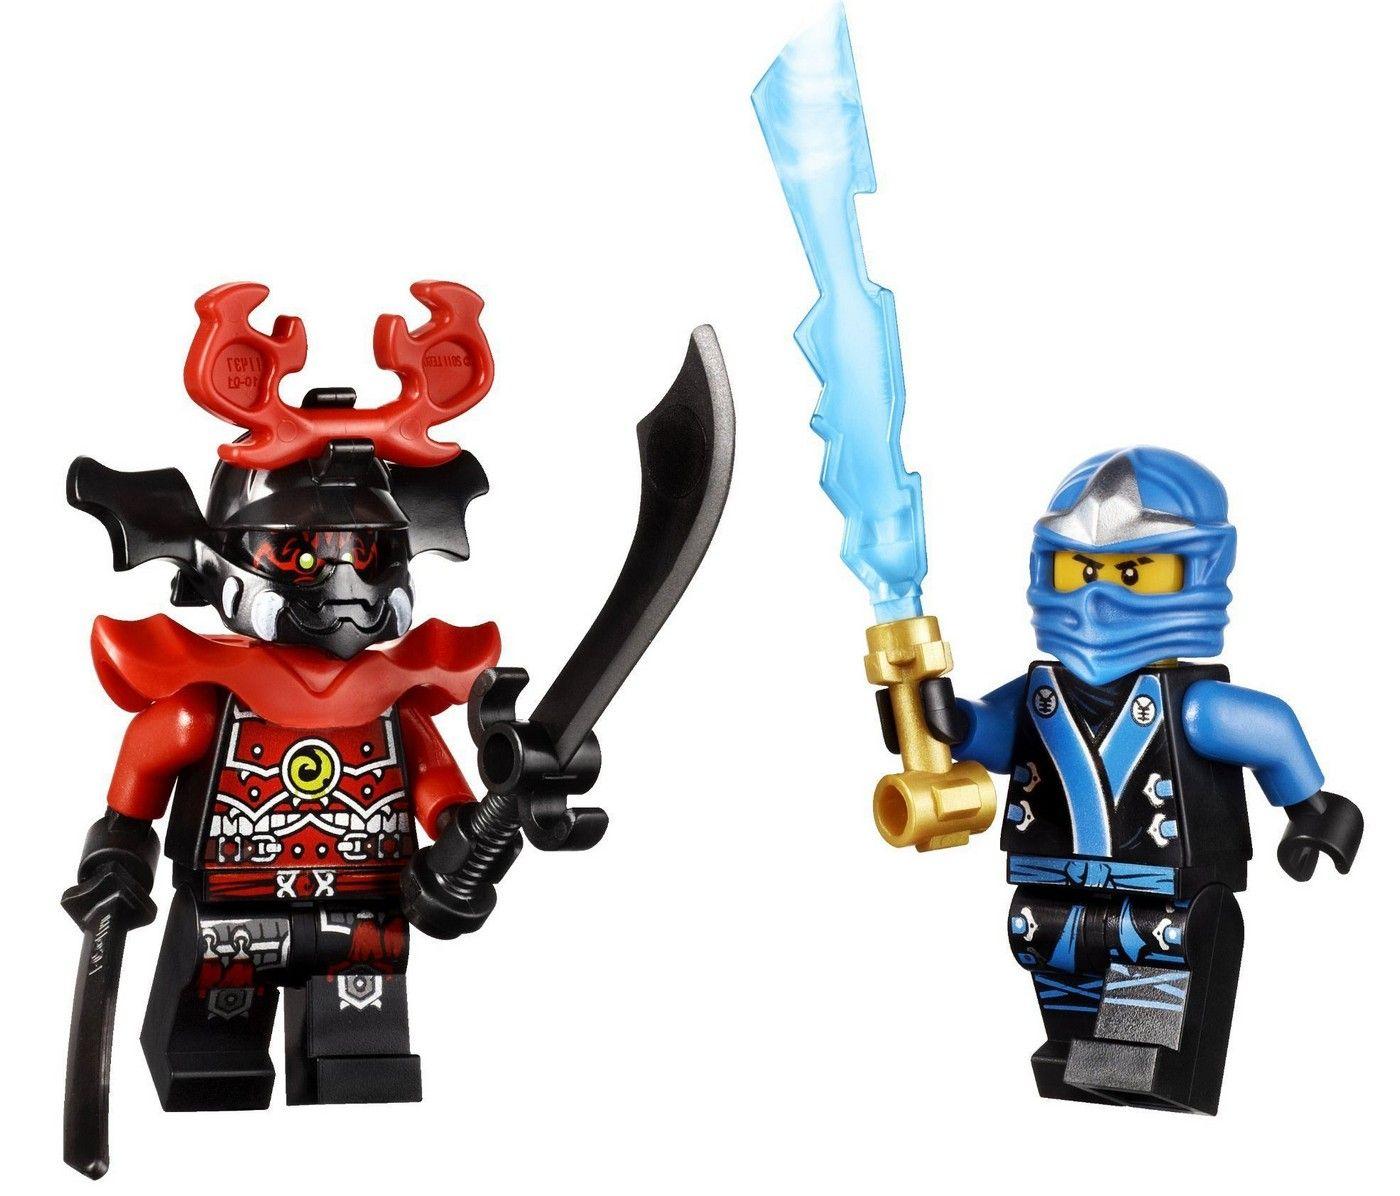 Lego Ninja Toys : Lego the warrior bike i brick city